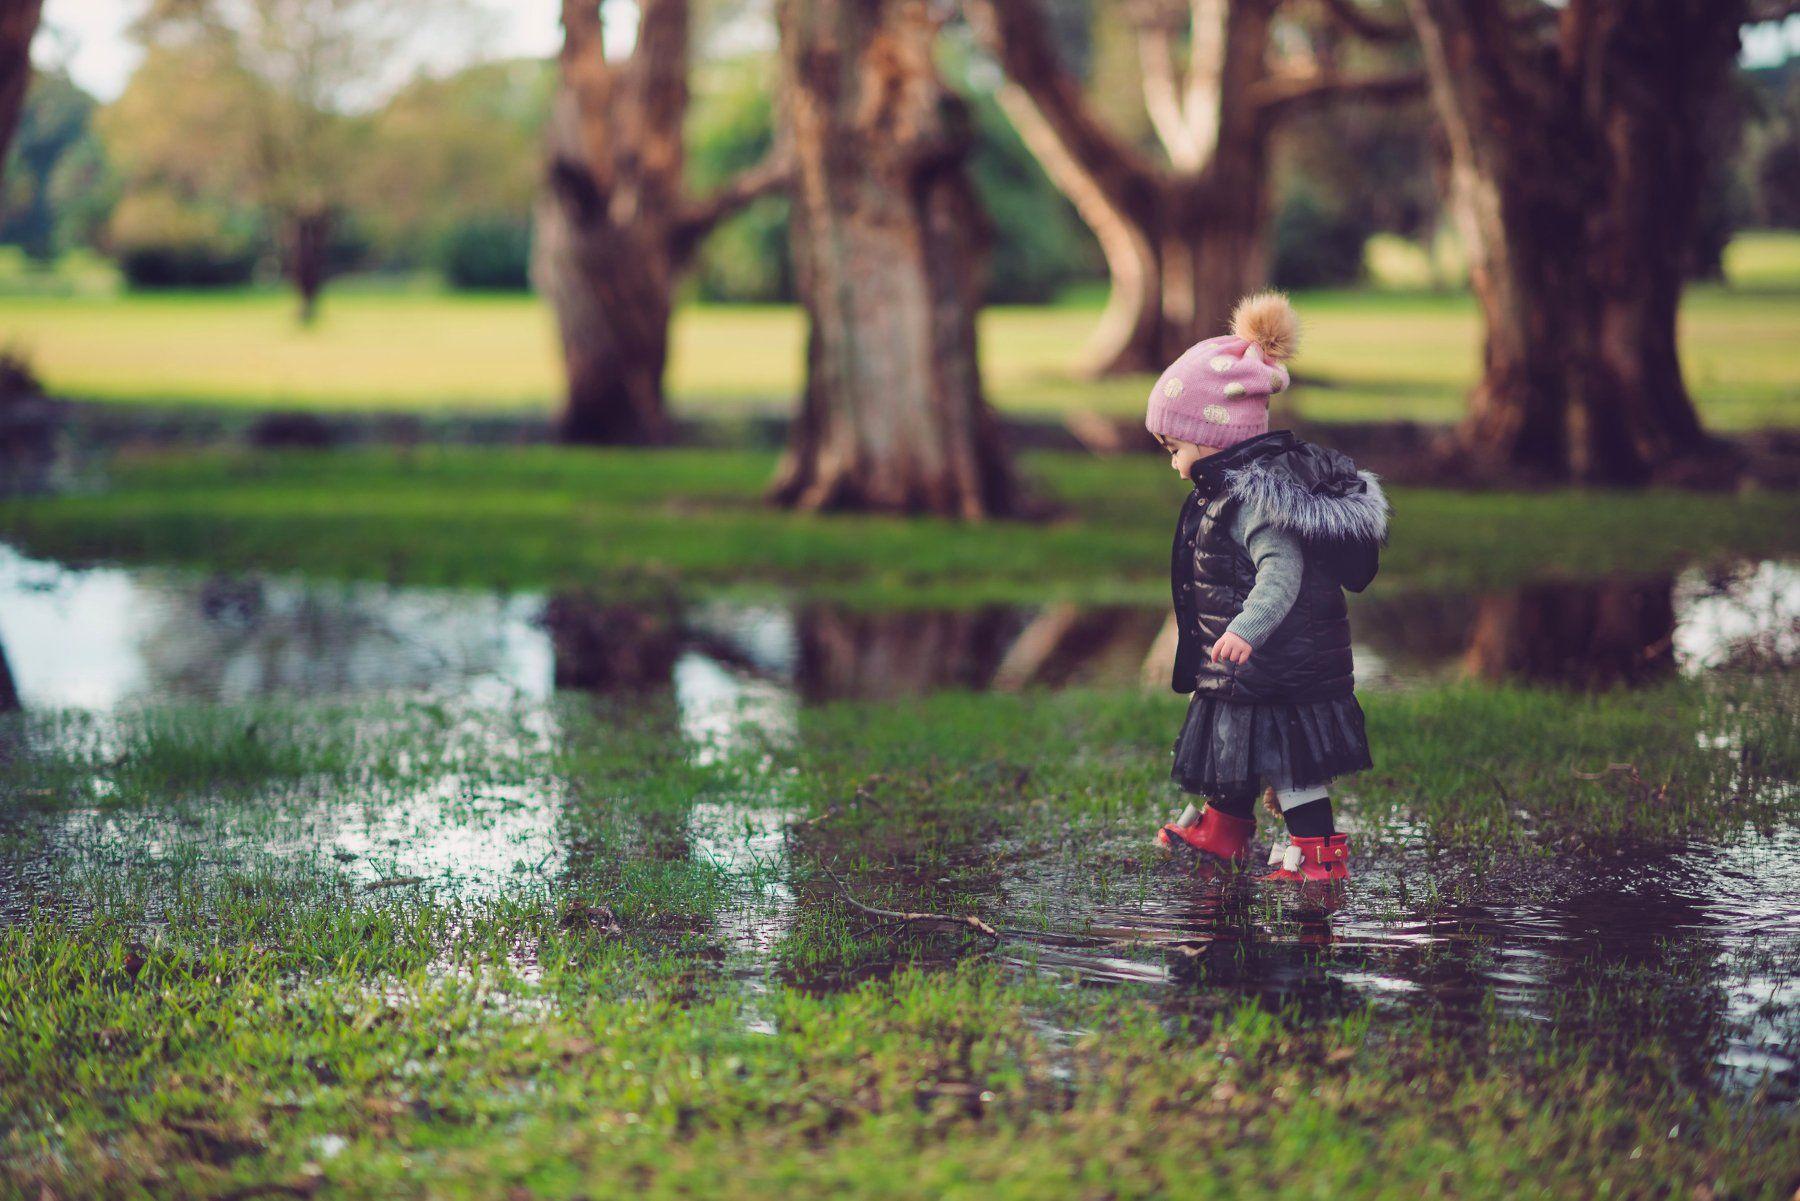 kid, child, girl, wet, rainy, adventurer, park, Derek Zhang